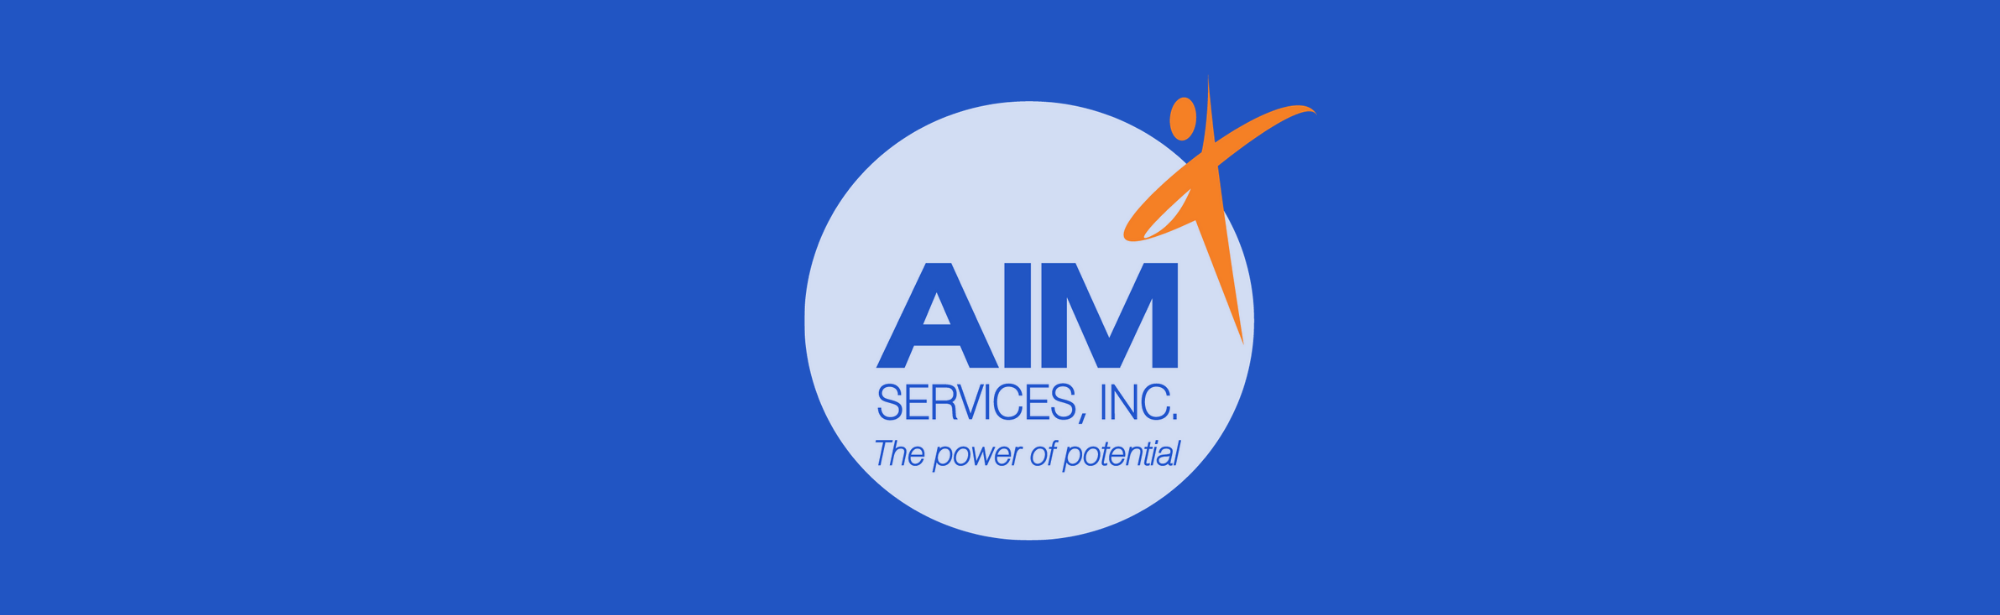 AIM logo on bright blue background